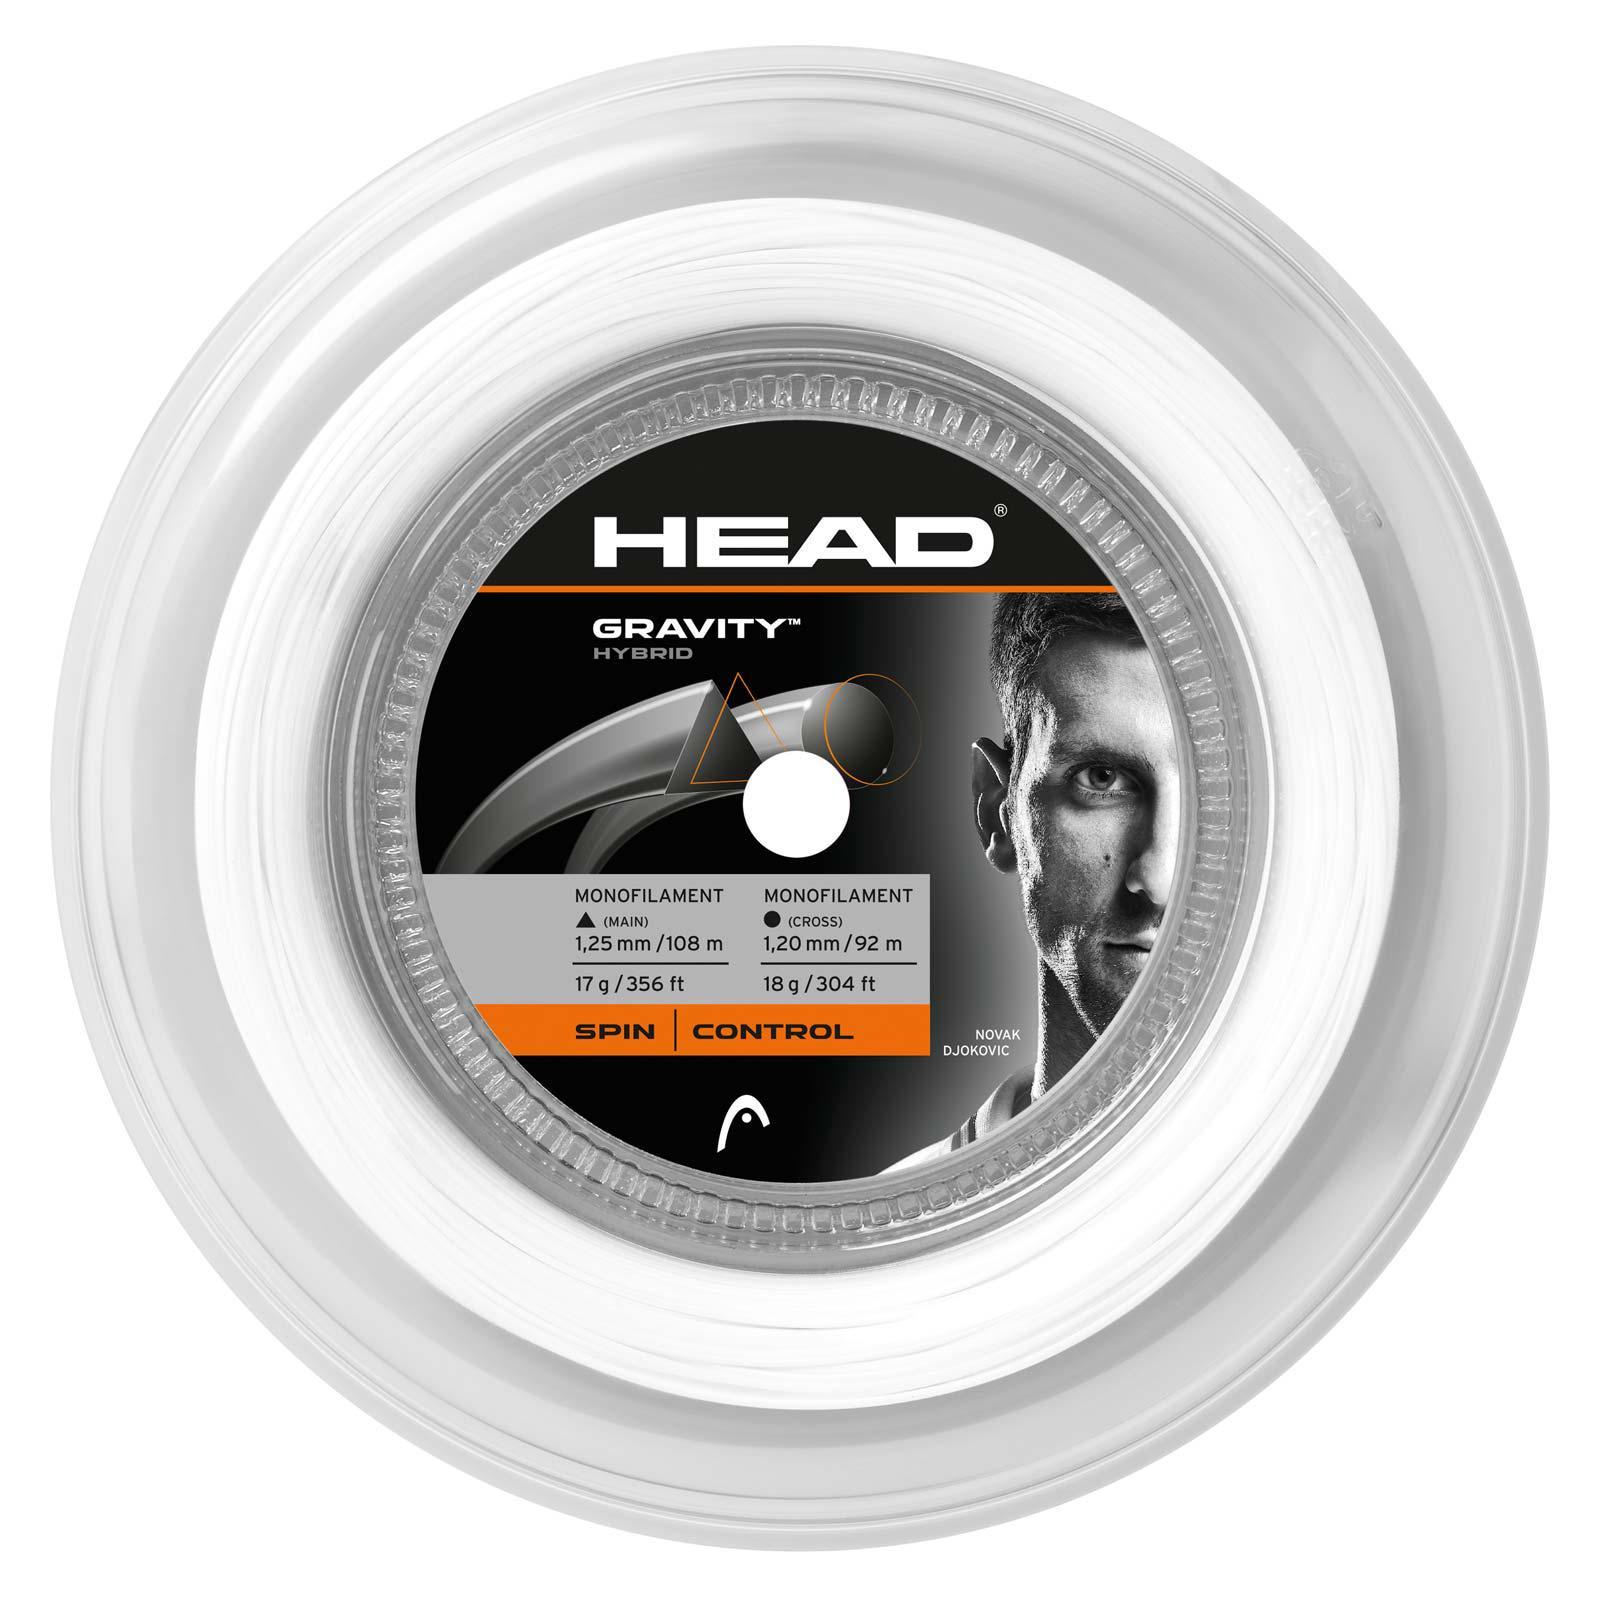 Head Gravity Tennis String 200m Reel